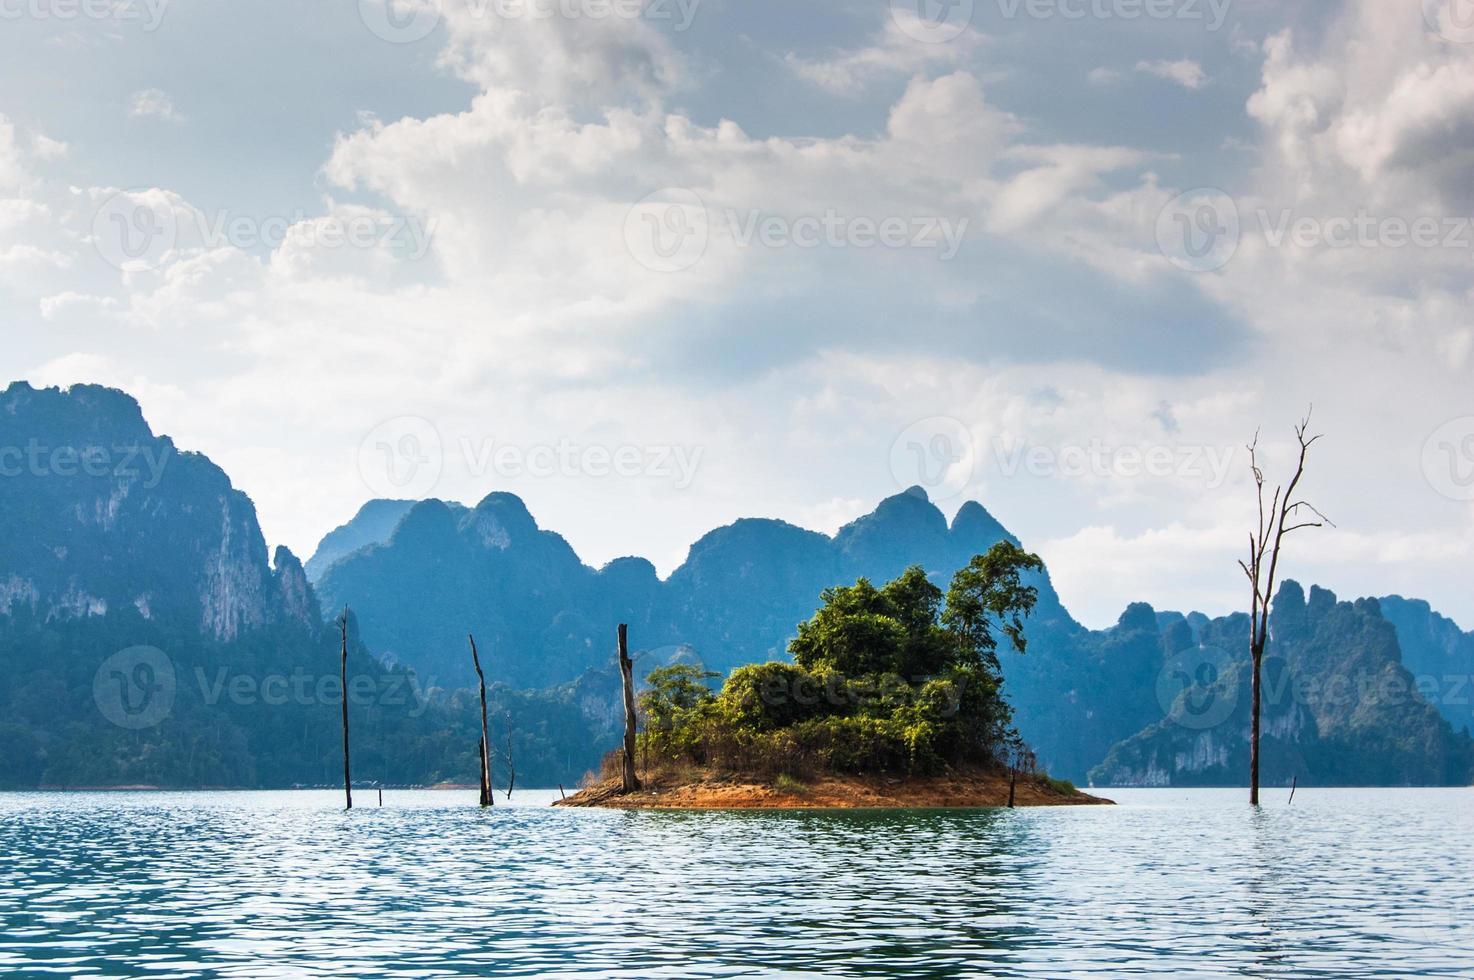 piccola isola, parco nazionale di khao sok foto